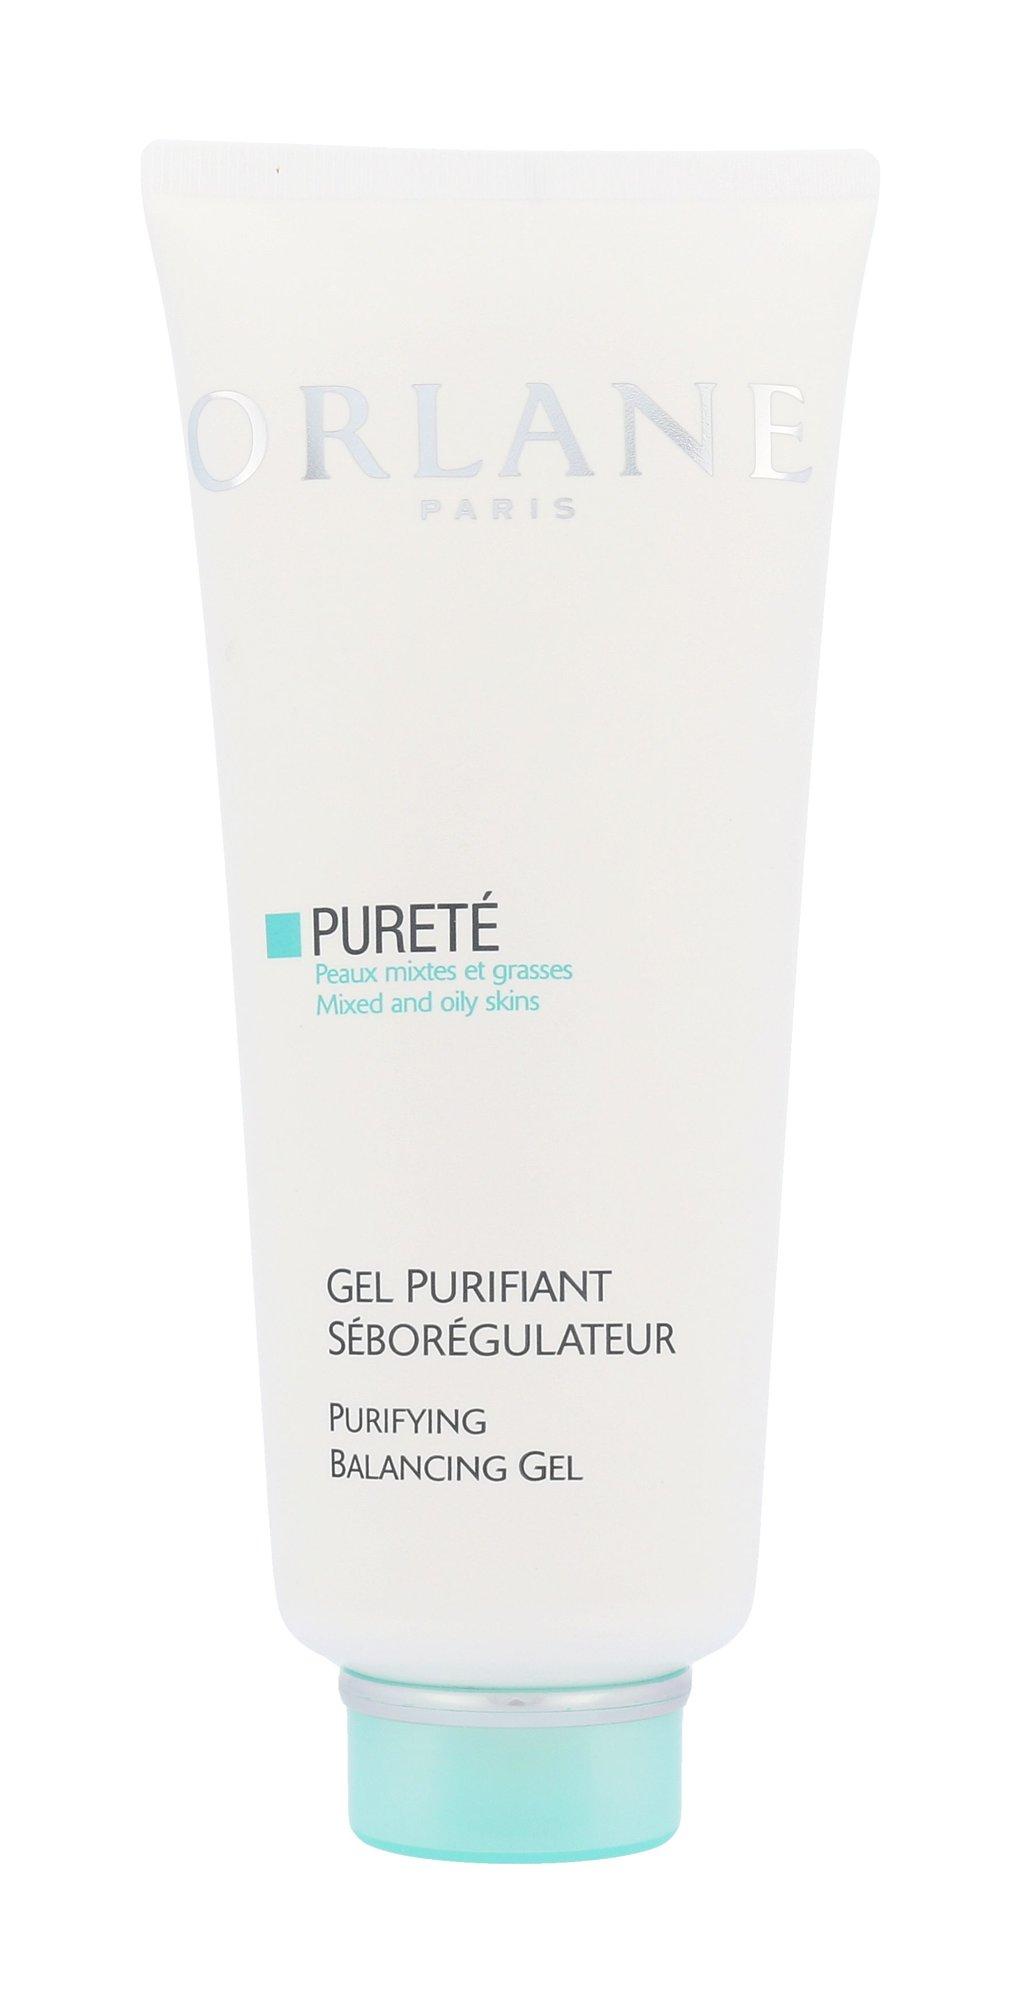 Orlane Pureté Cosmetic 200ml